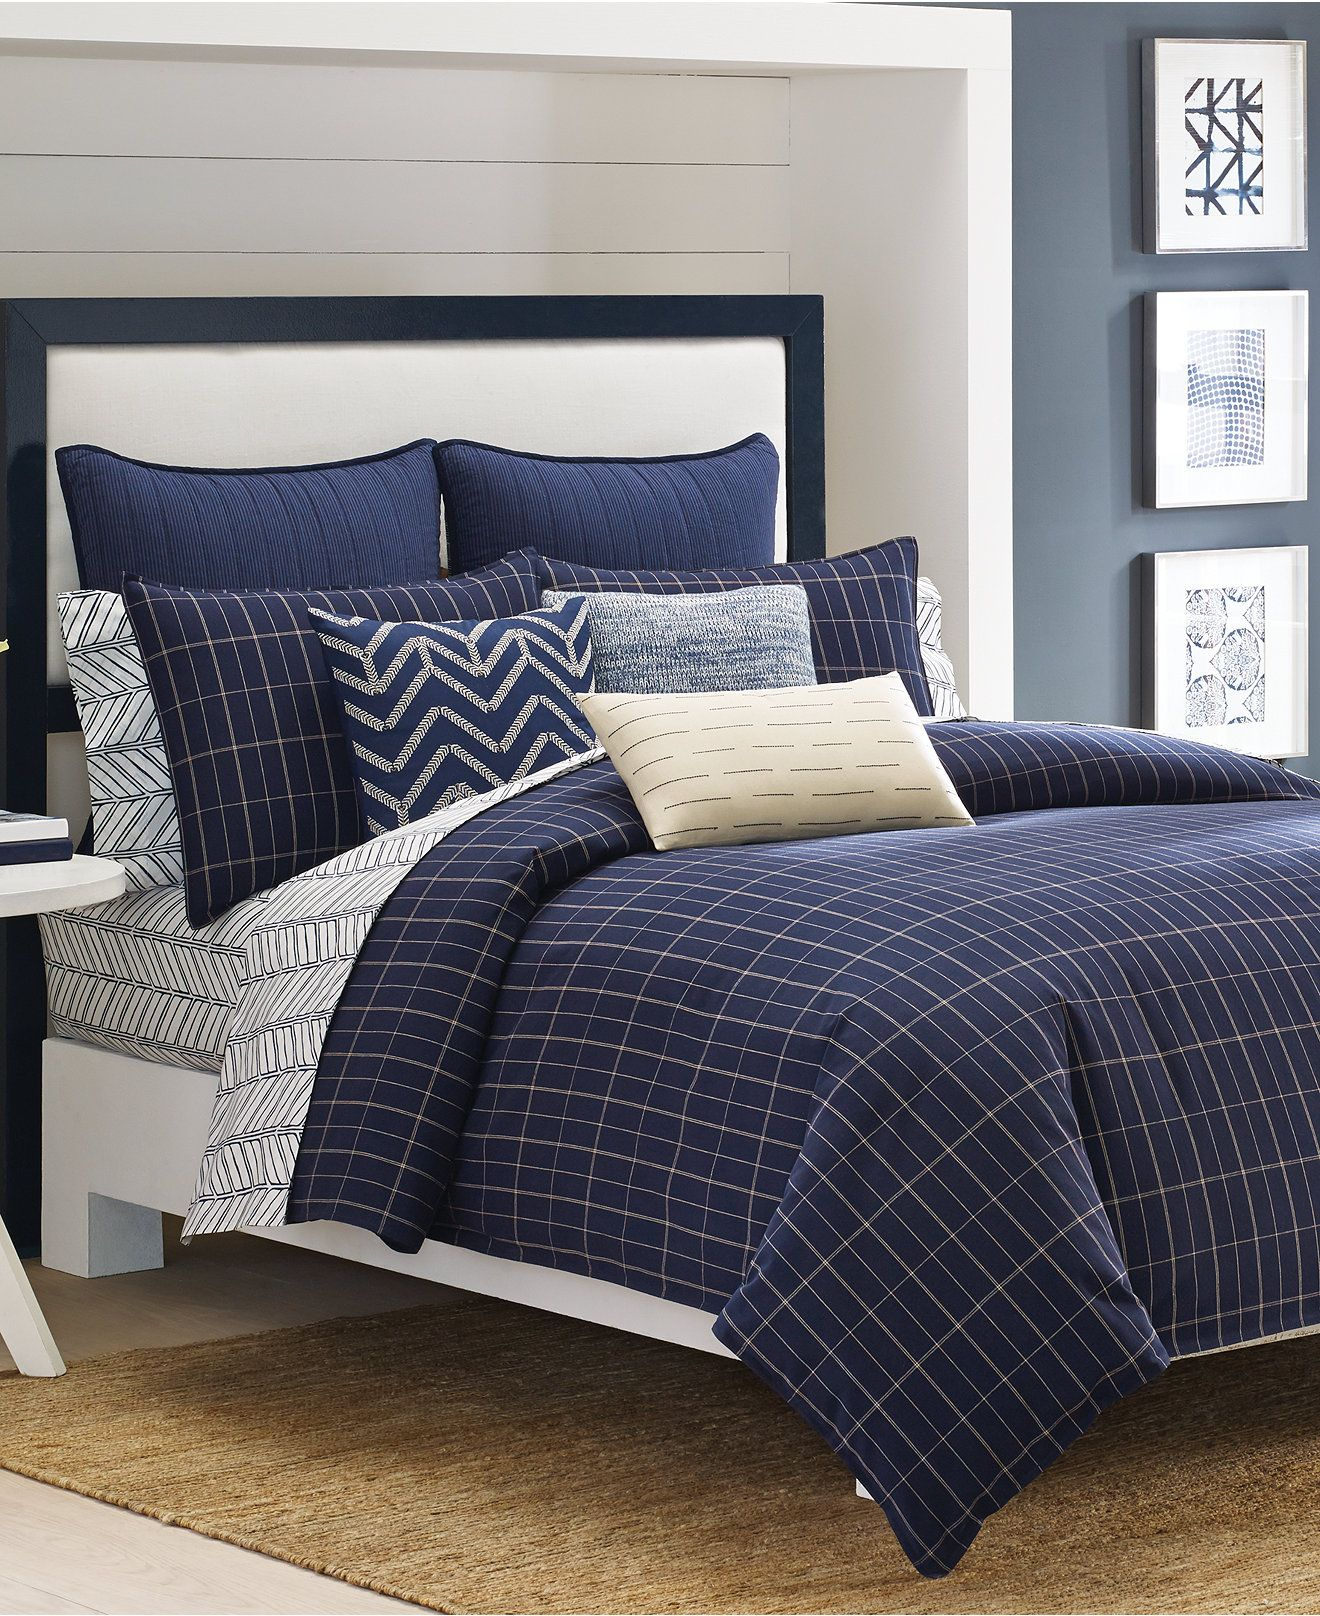 street ideas pinterest pin nautica set bridge comforter sets chatham home king